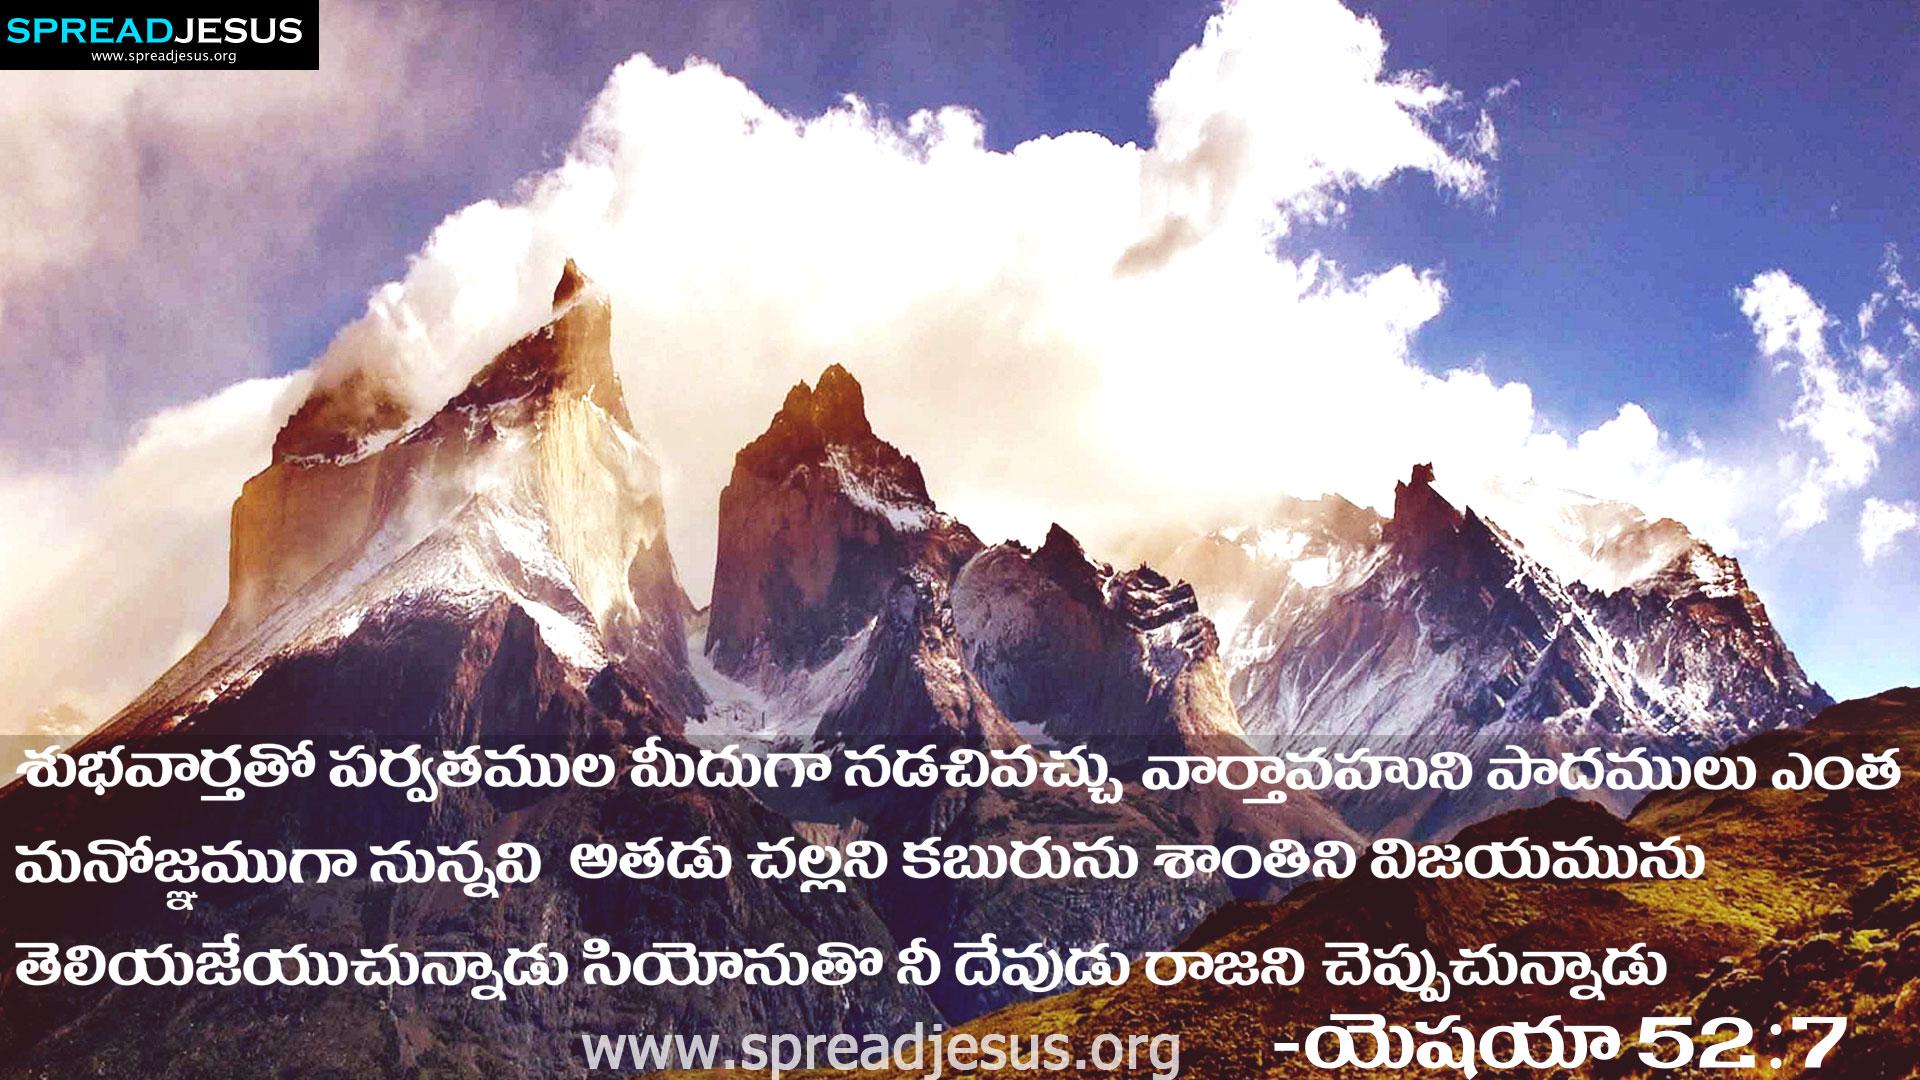 TELUGU BIBLE QUOTES HD WALLPAPERS YESHAYA 52 7 FREE DOWNLOAD